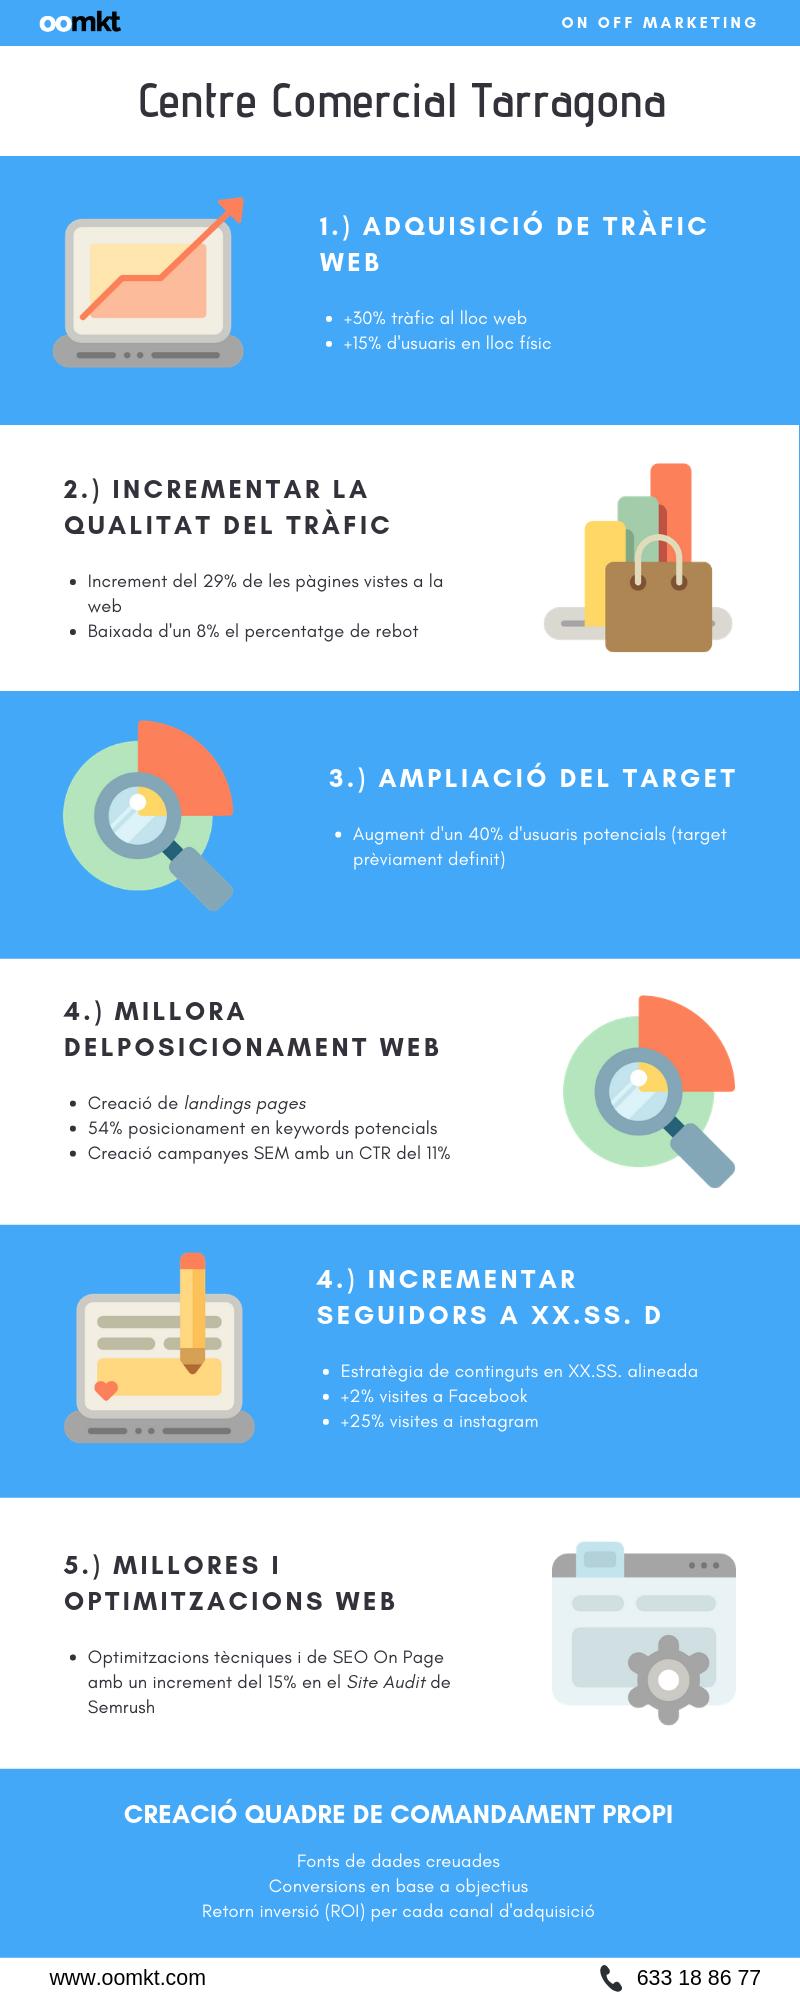 Infografia - Centre Comecial Tarragona OOMKT